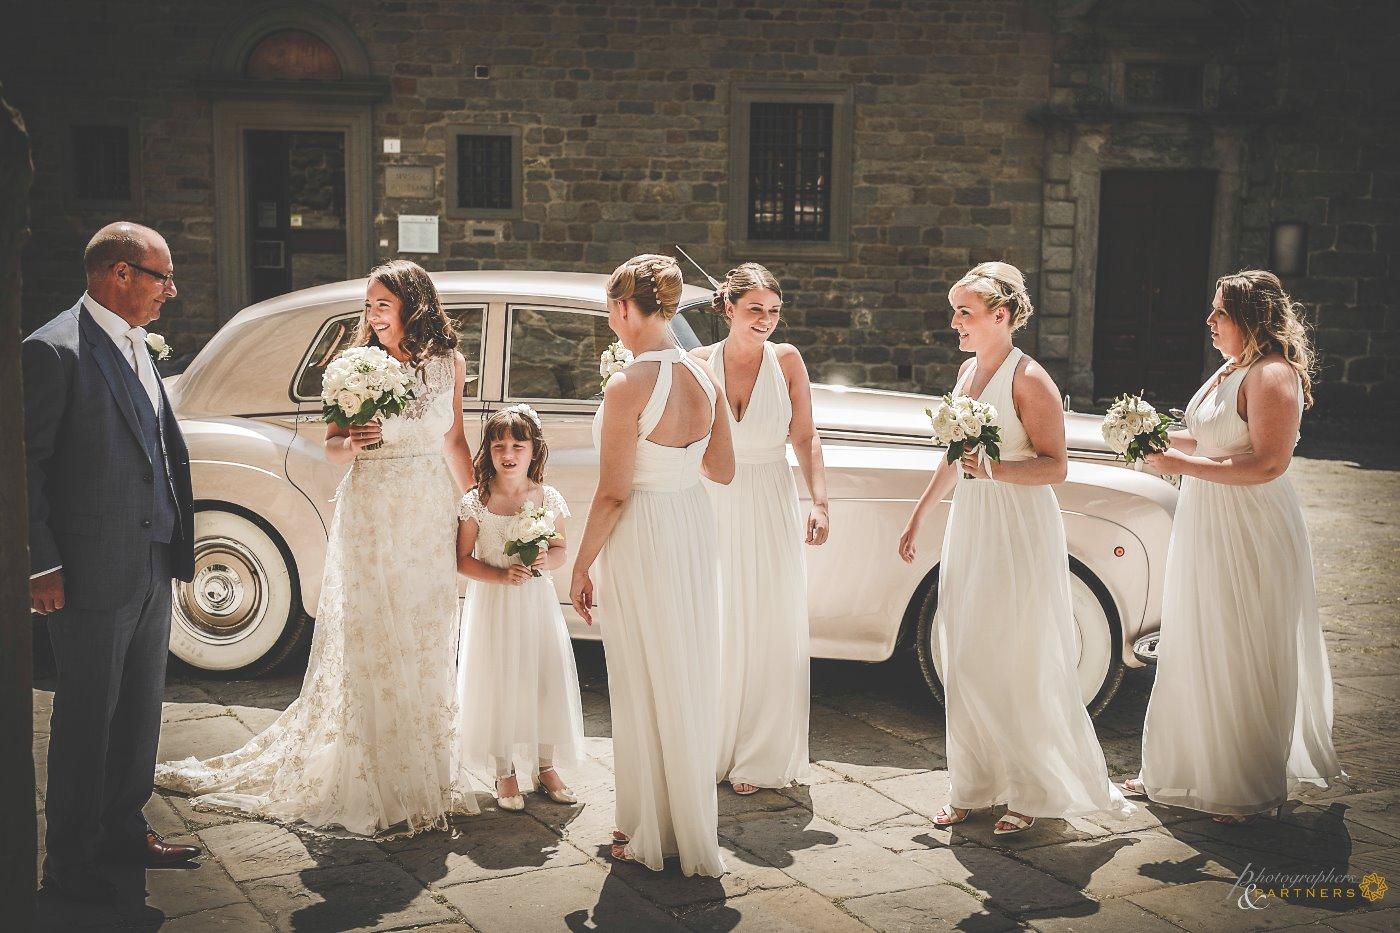 photography_weddings_umbria_04.jpg